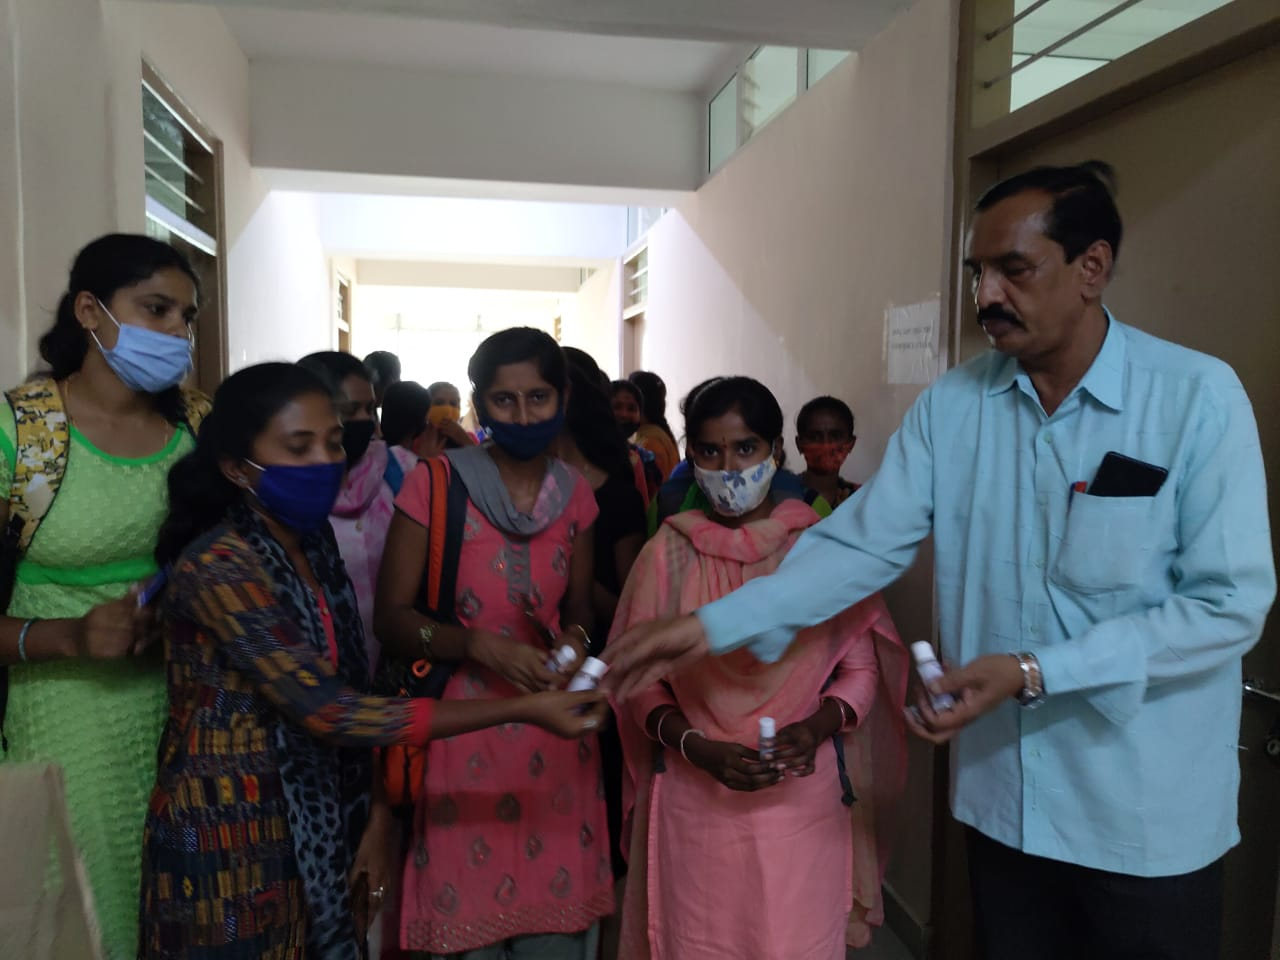 /media/burds/1NGO-00306-Bharath_Urban_And_Rural_Development_Trust-Activities-Sanitizers_Distribution.jpg